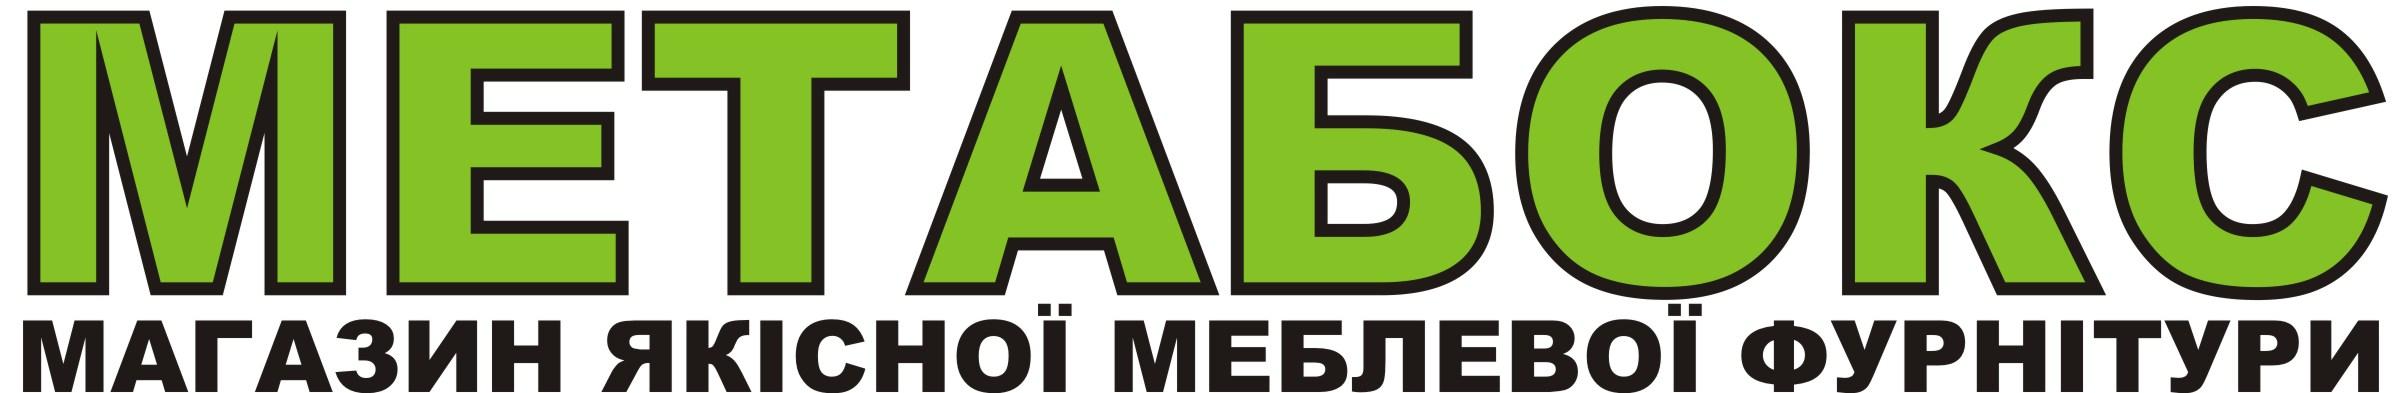 Метабокс, ЧП, Коломыя